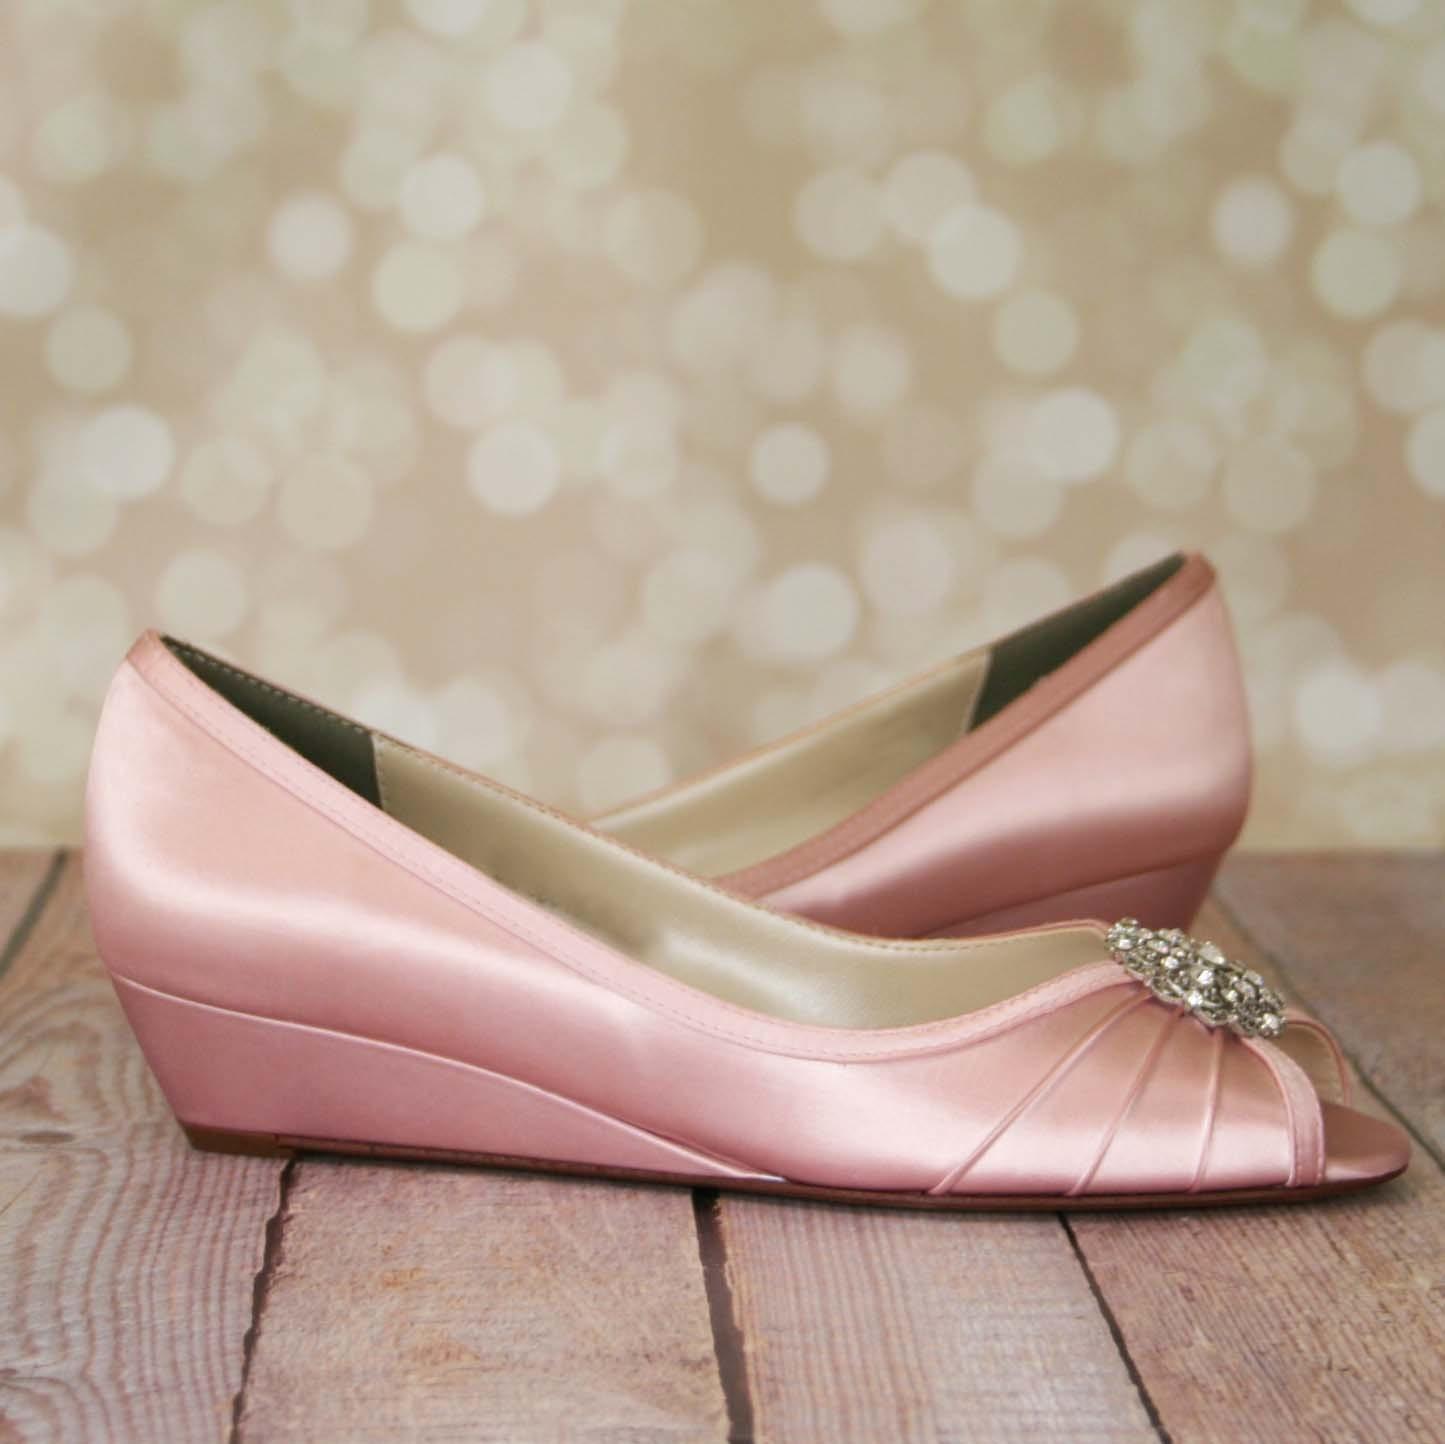 Pink Heels For Wedding: Pink Wedding Shoes Blush Pink Shoes Vintage Wedding Shoes